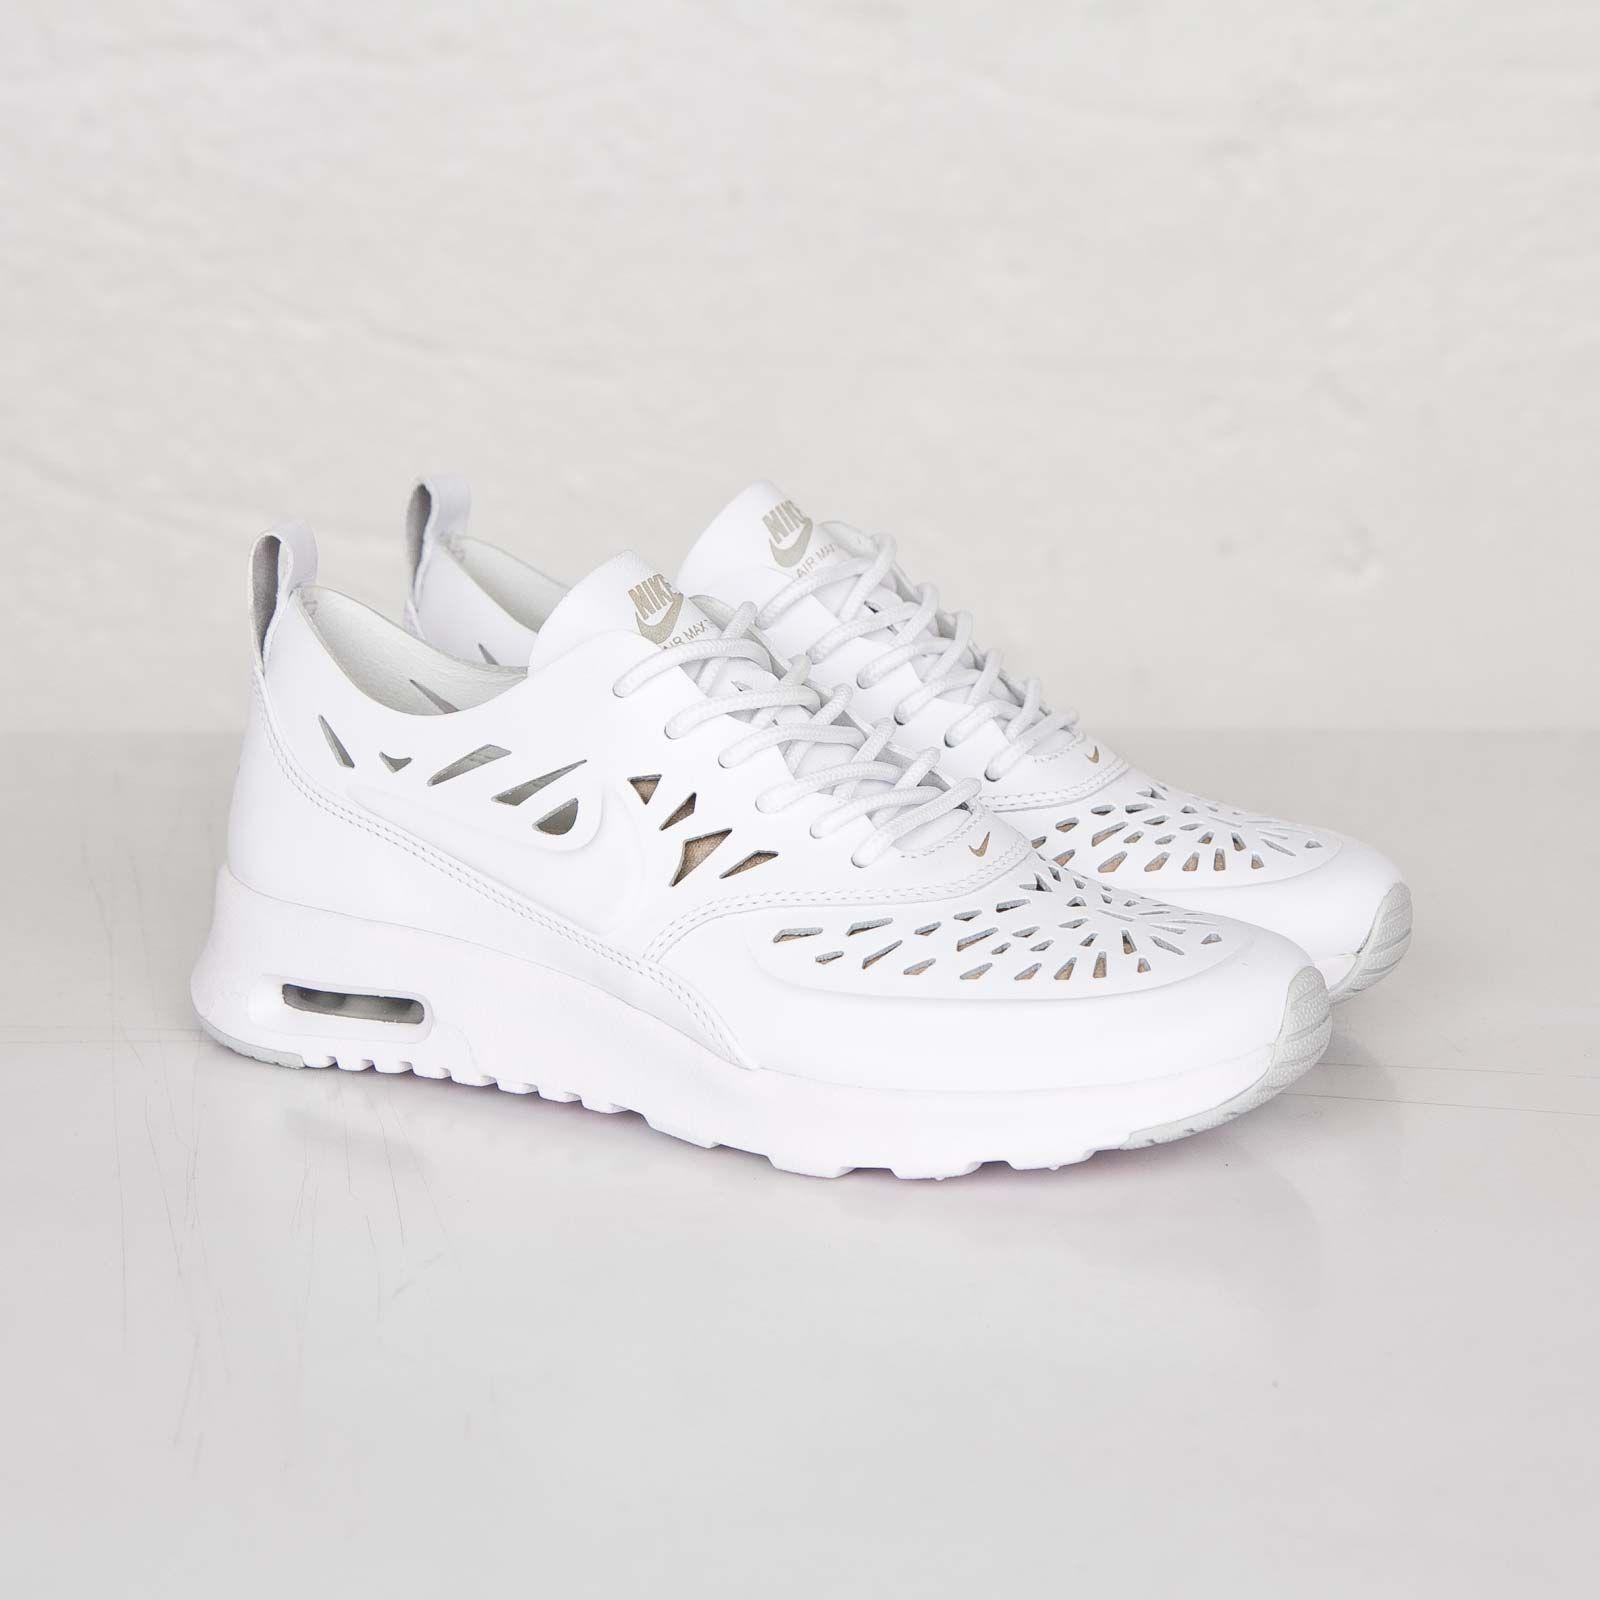 pas mal 2a247 a5a74 Nike W Air Max Thea Joli | sneakers | Chaussure, Chaussures ...